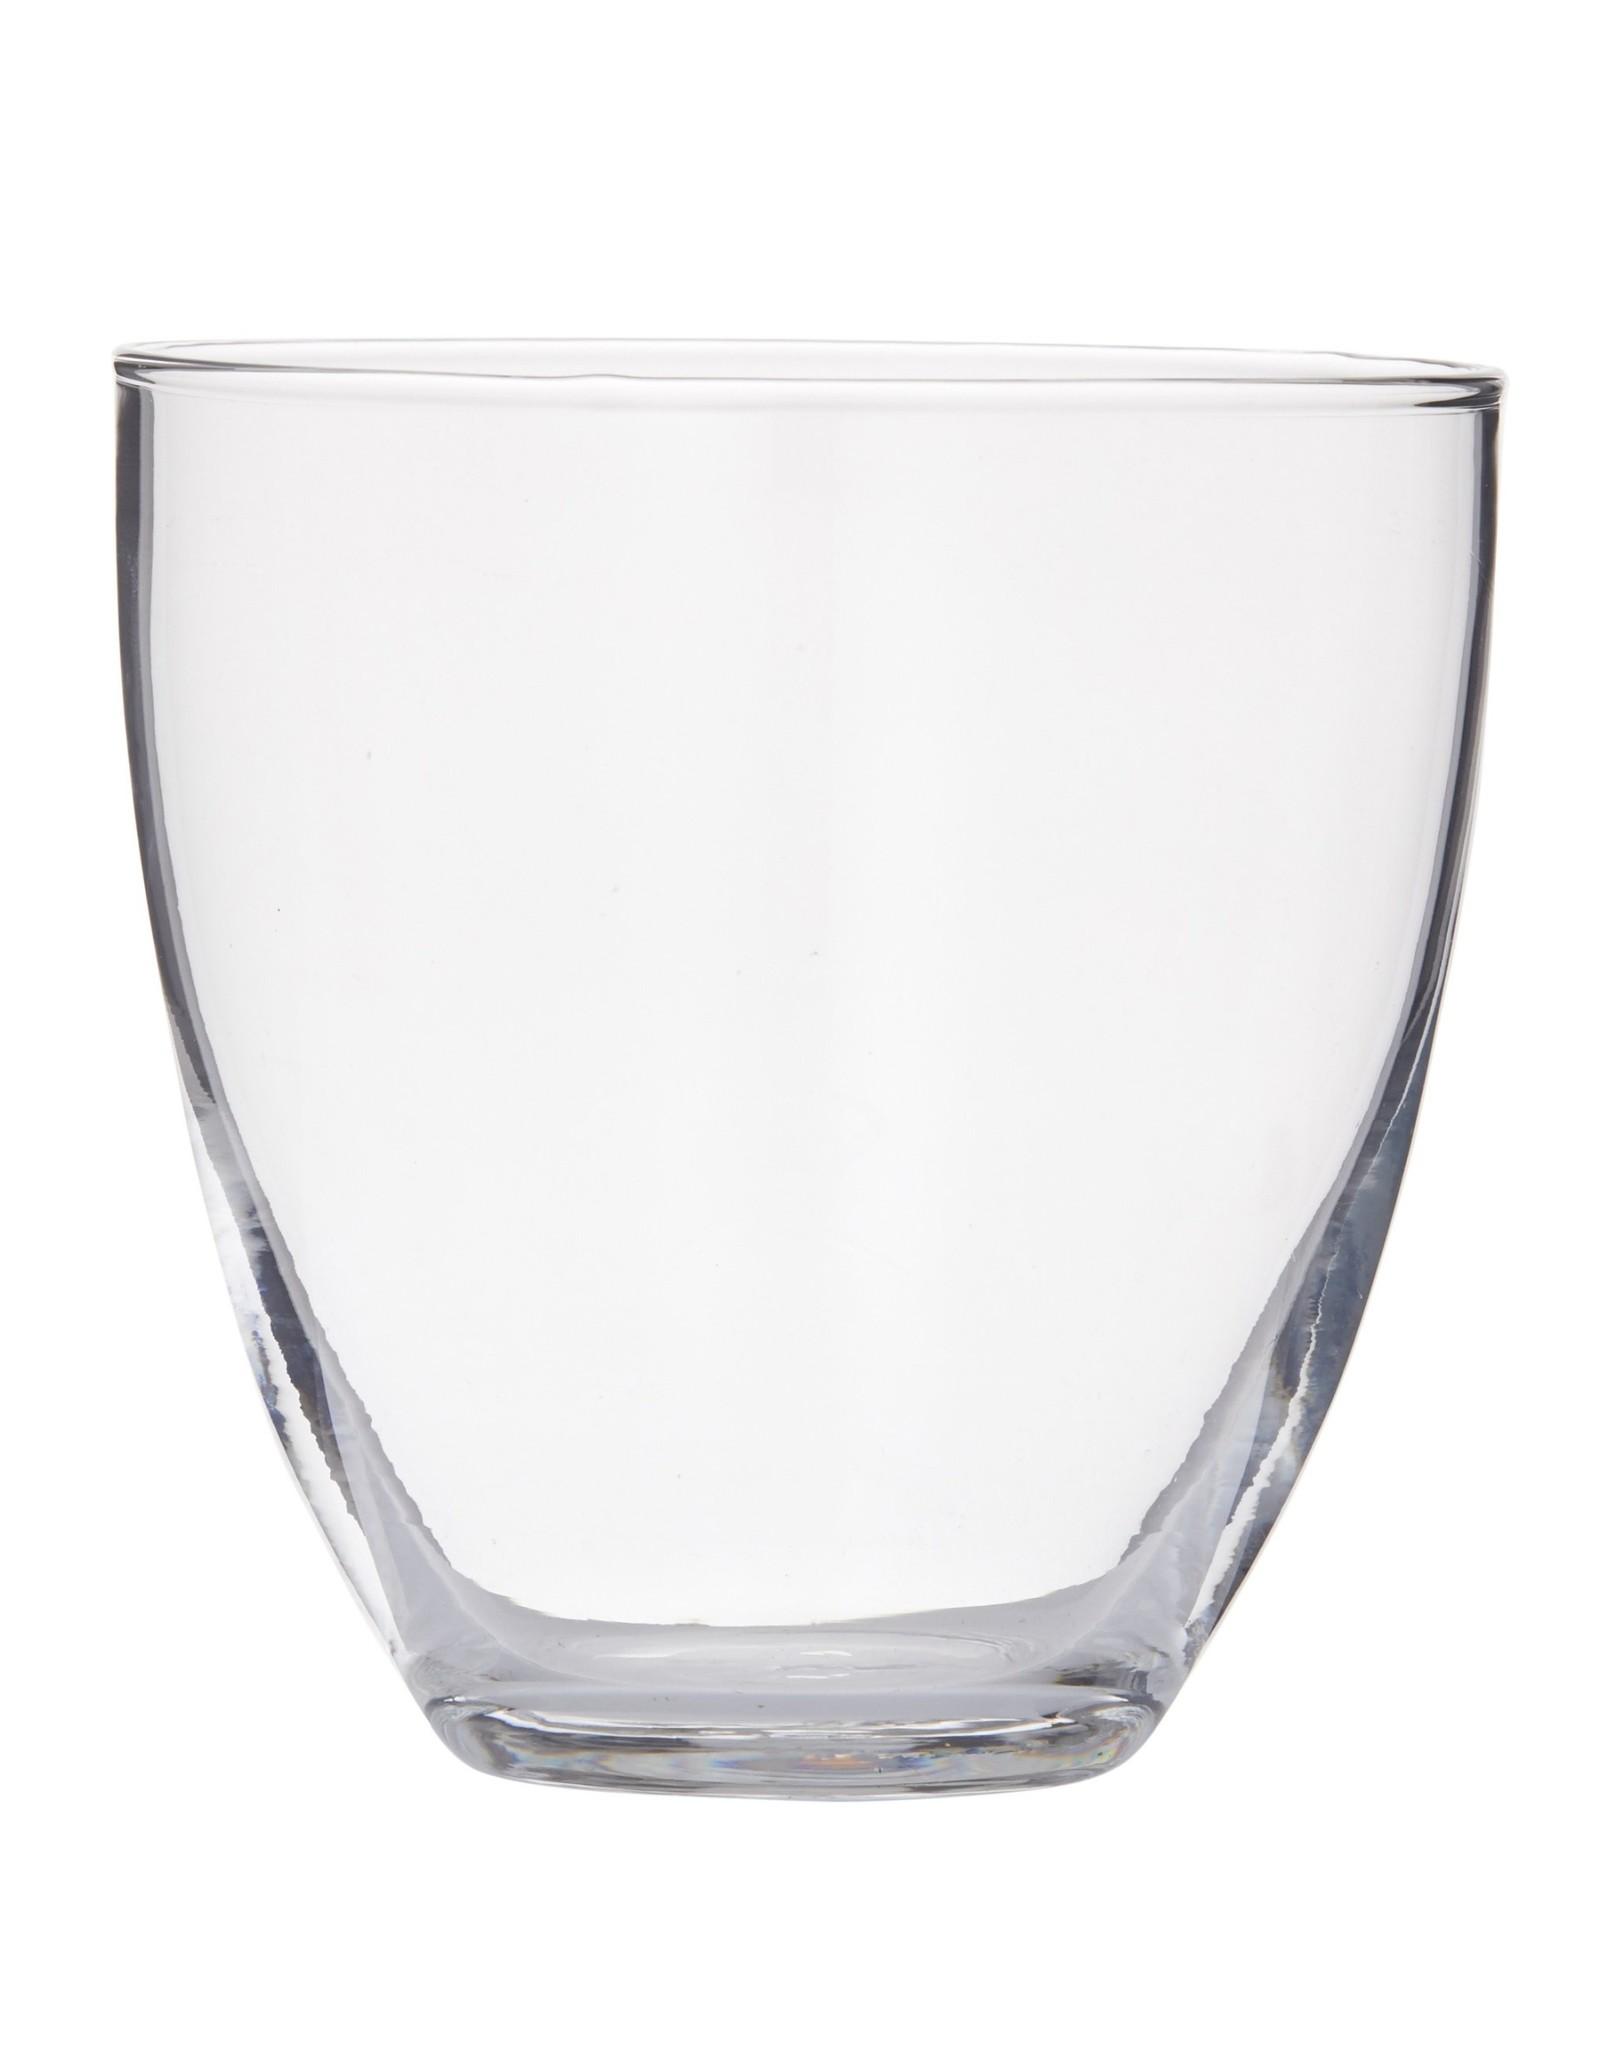 Rogue Annabelle Vase 21x21x21cm